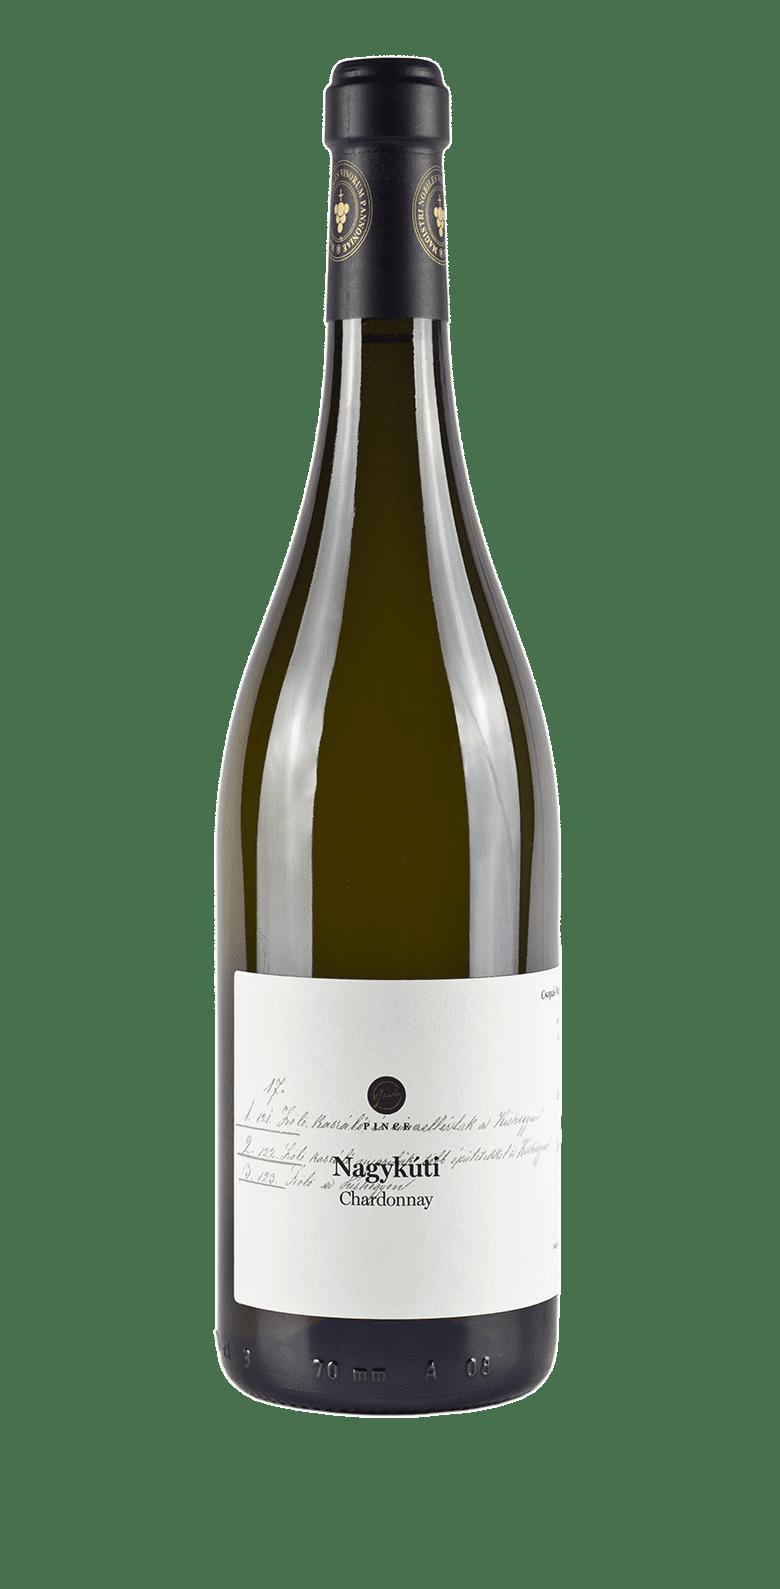 Nagykuti-Chardonnay-2017